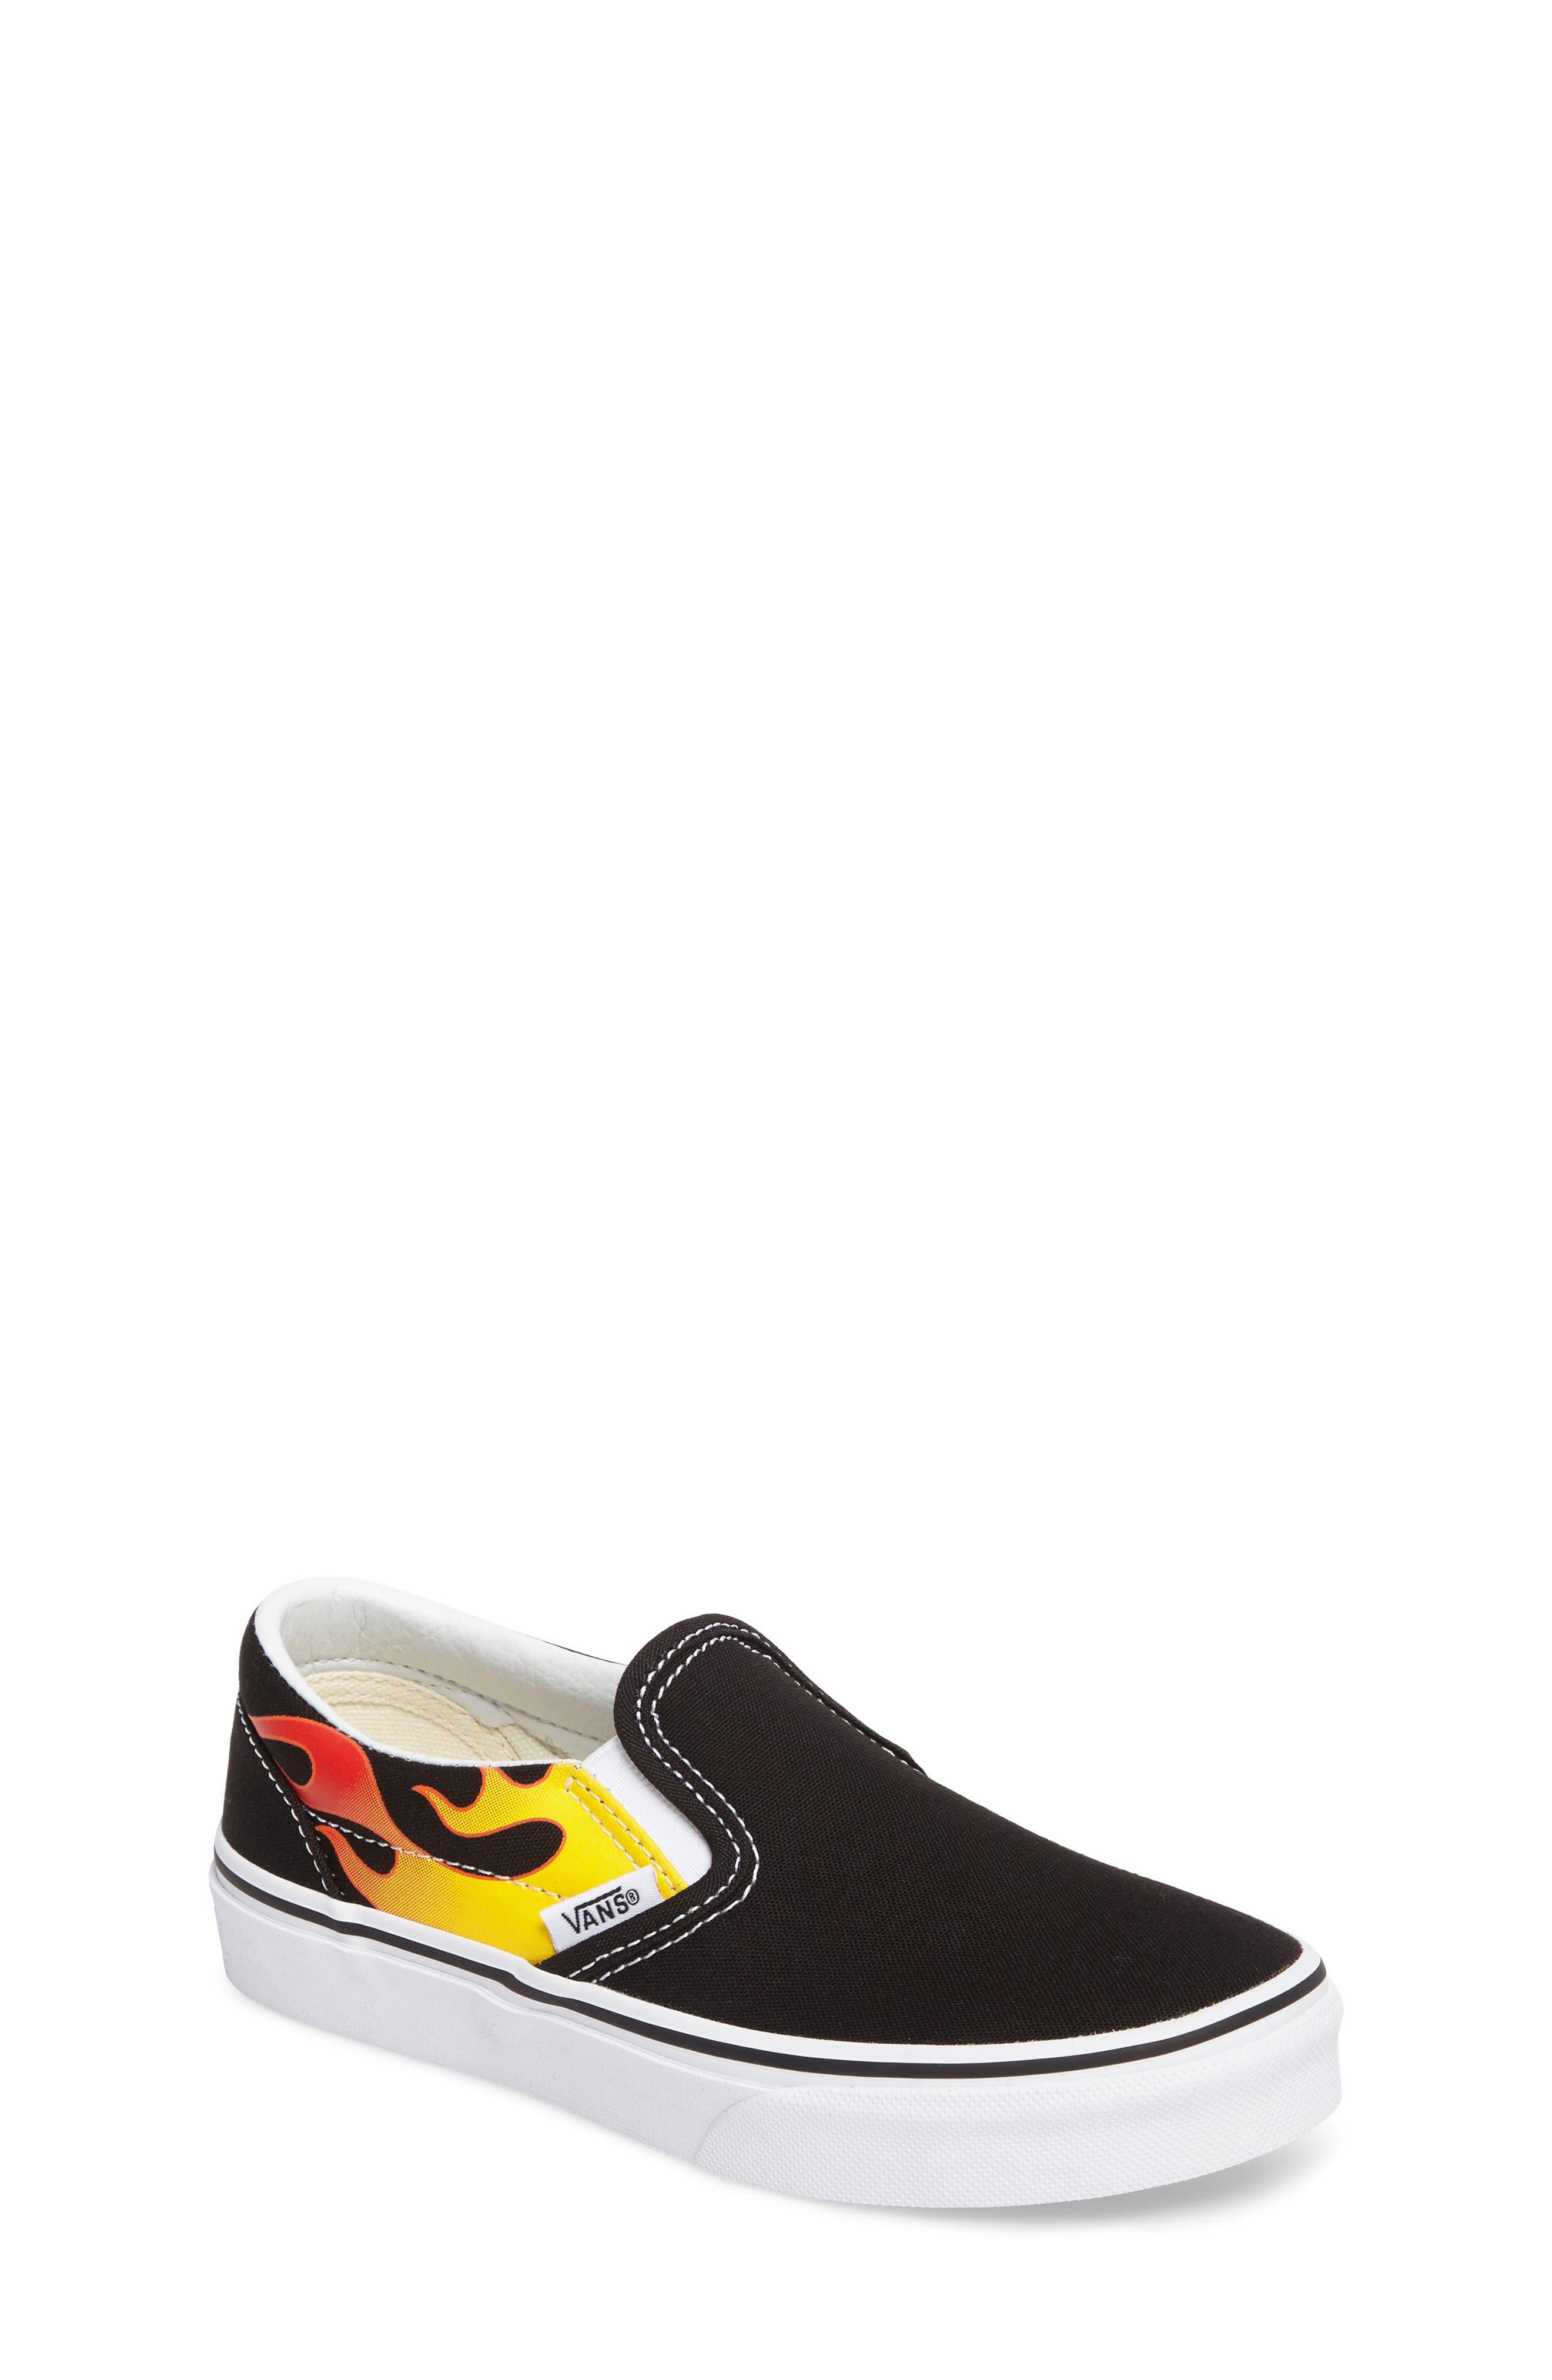 Flame Classic Slip-On Sneaker,                             Main thumbnail 1, color,                             002